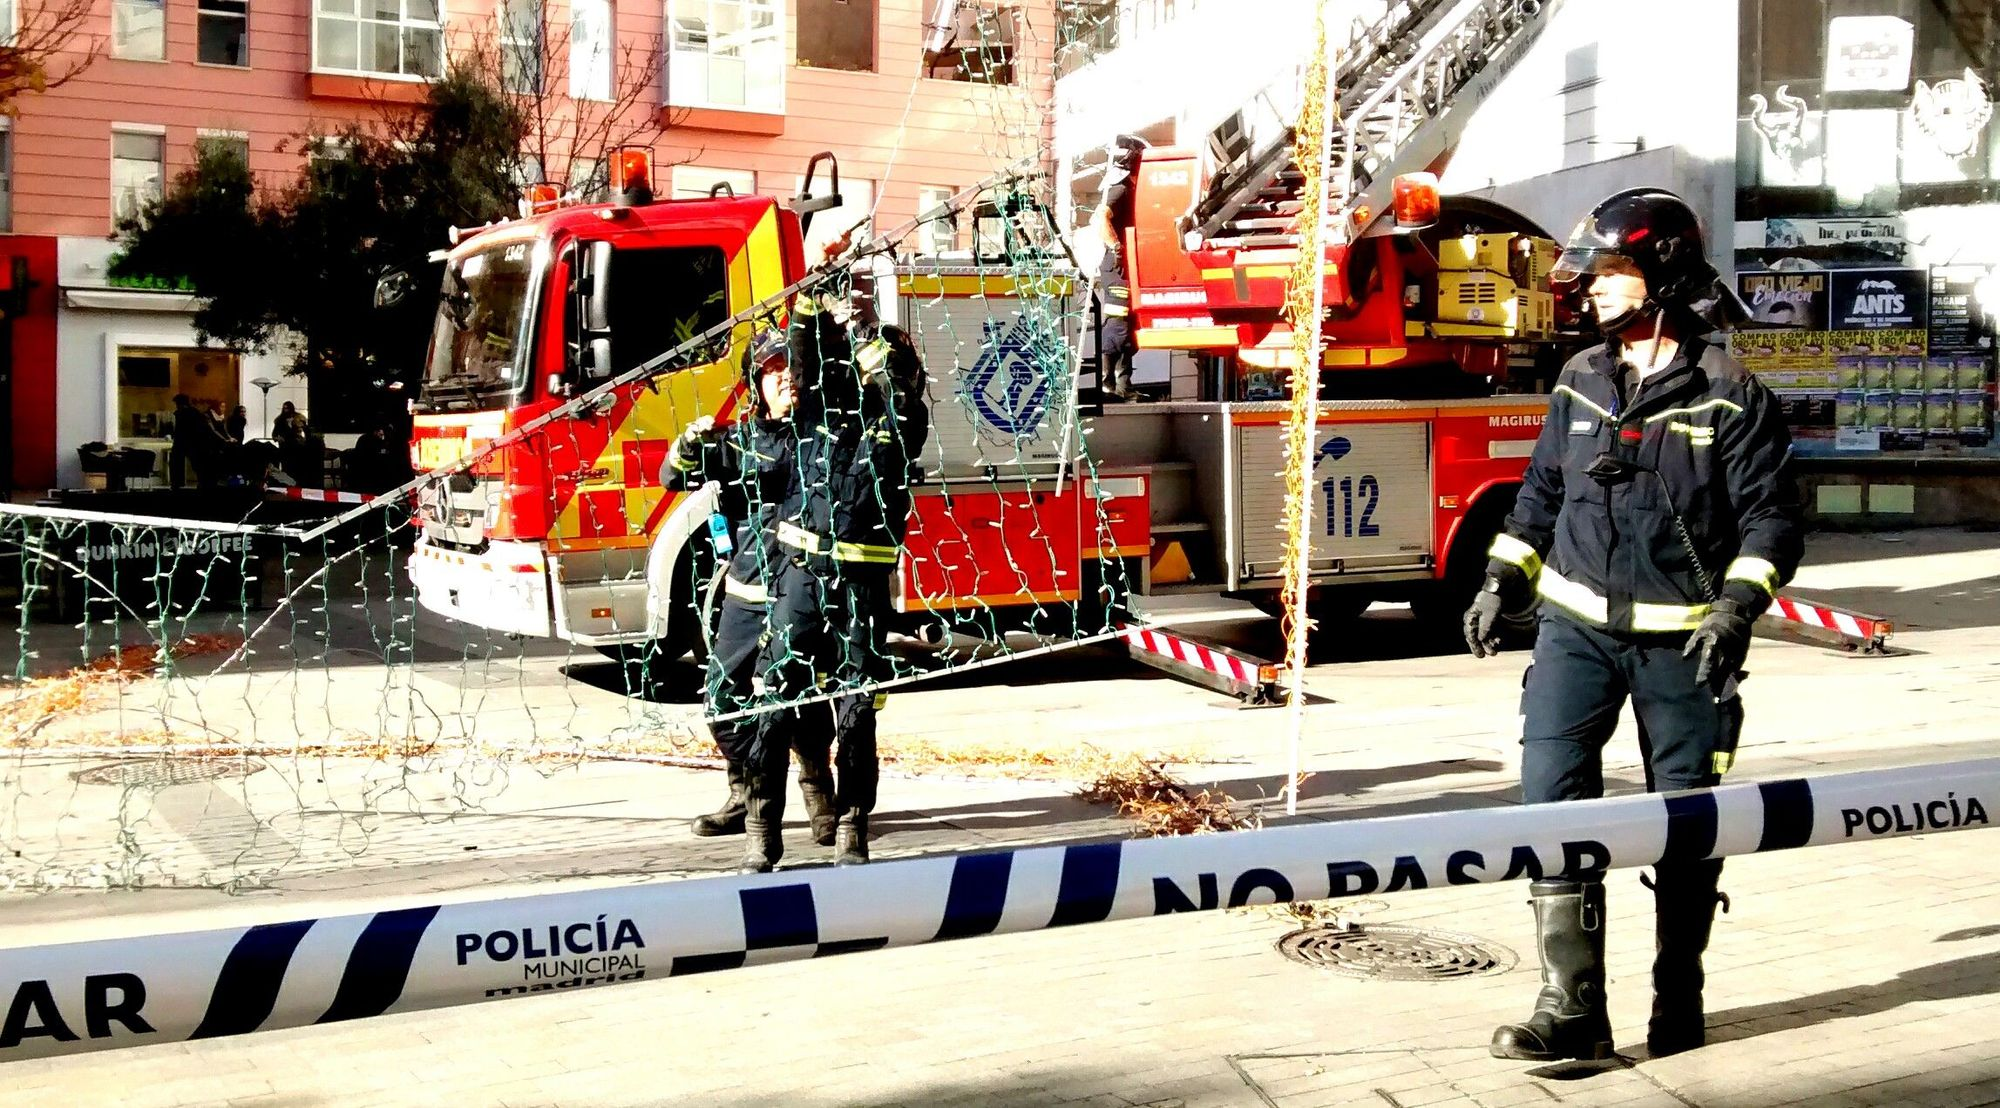 Bomberos descolgando el alumbrado navideño de Fuencarral   FOTO: SOMOS MALASAÑA